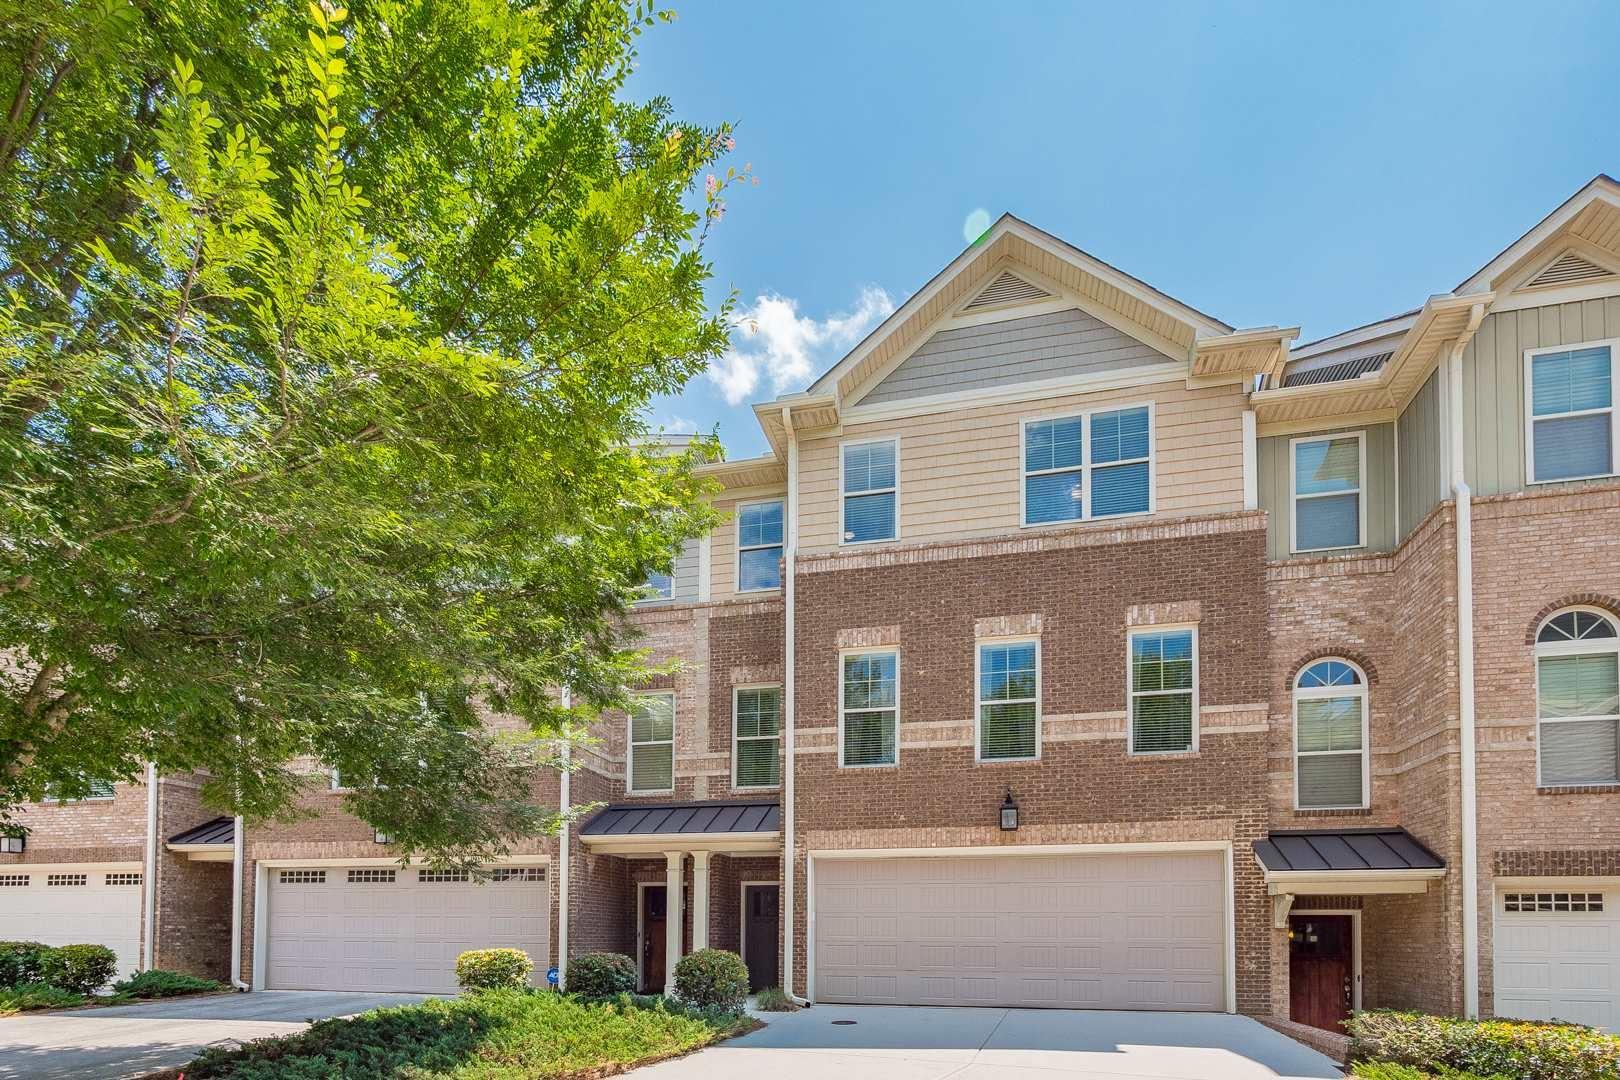 2451 Palladian Manor Way, Atlanta, GA 30339 - MLS#: 8817376